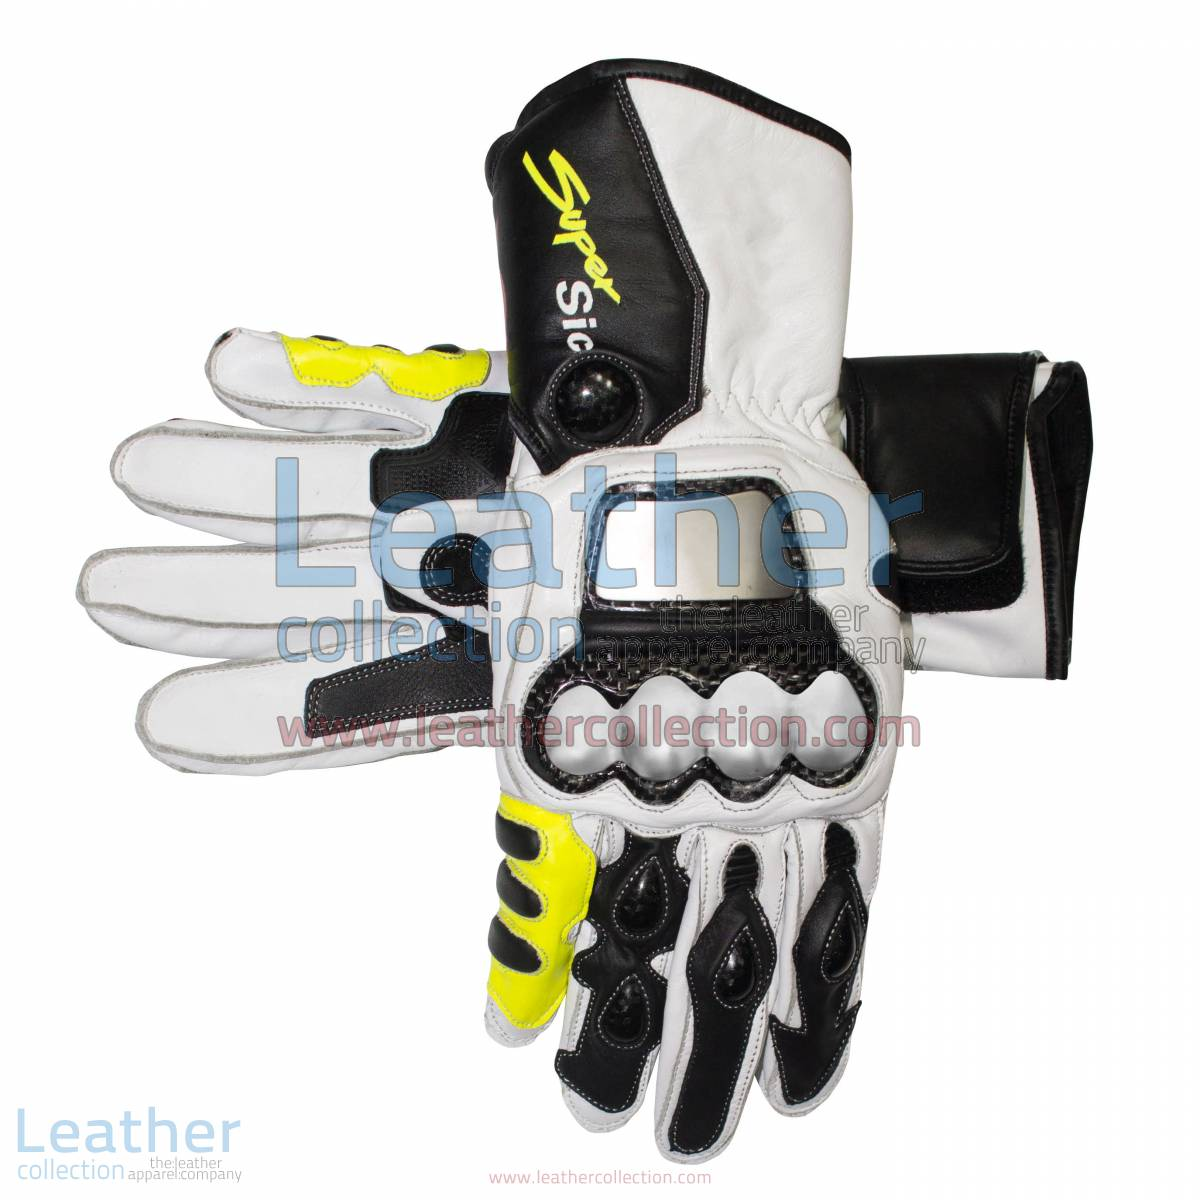 Simoncelli Super Sic Racing Gloves | simoncelli